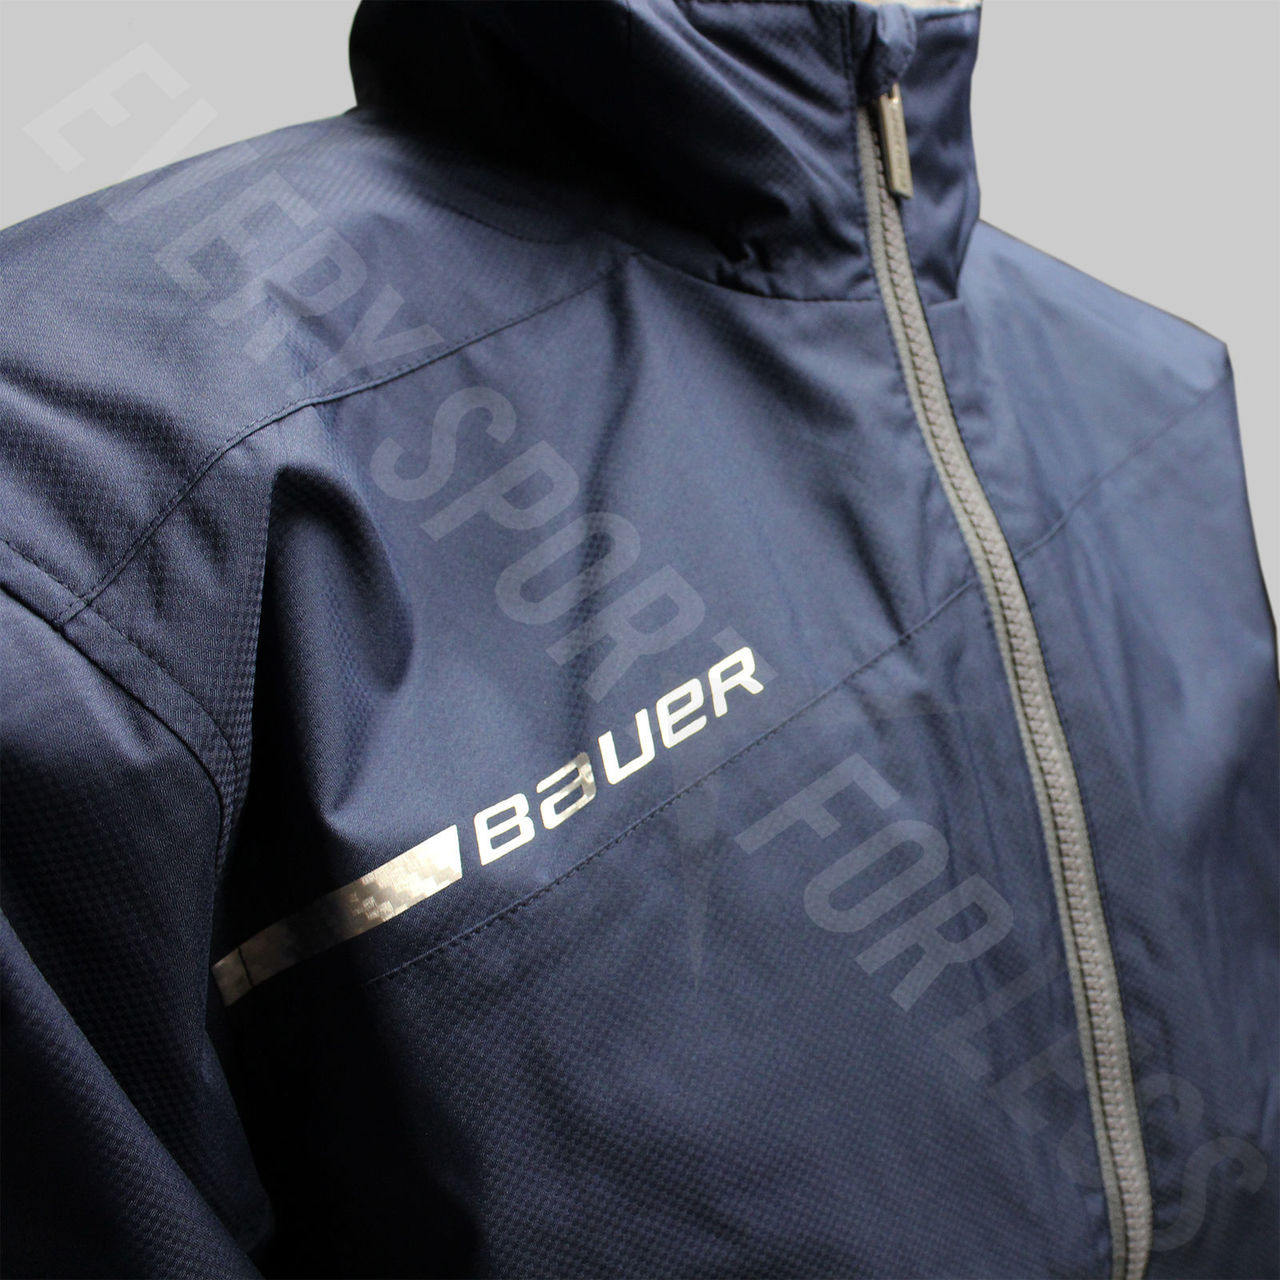 ef773e90a4f Bauer Hockey 100% Polyester Senior Flex Long Sleeve Jacket - Navy